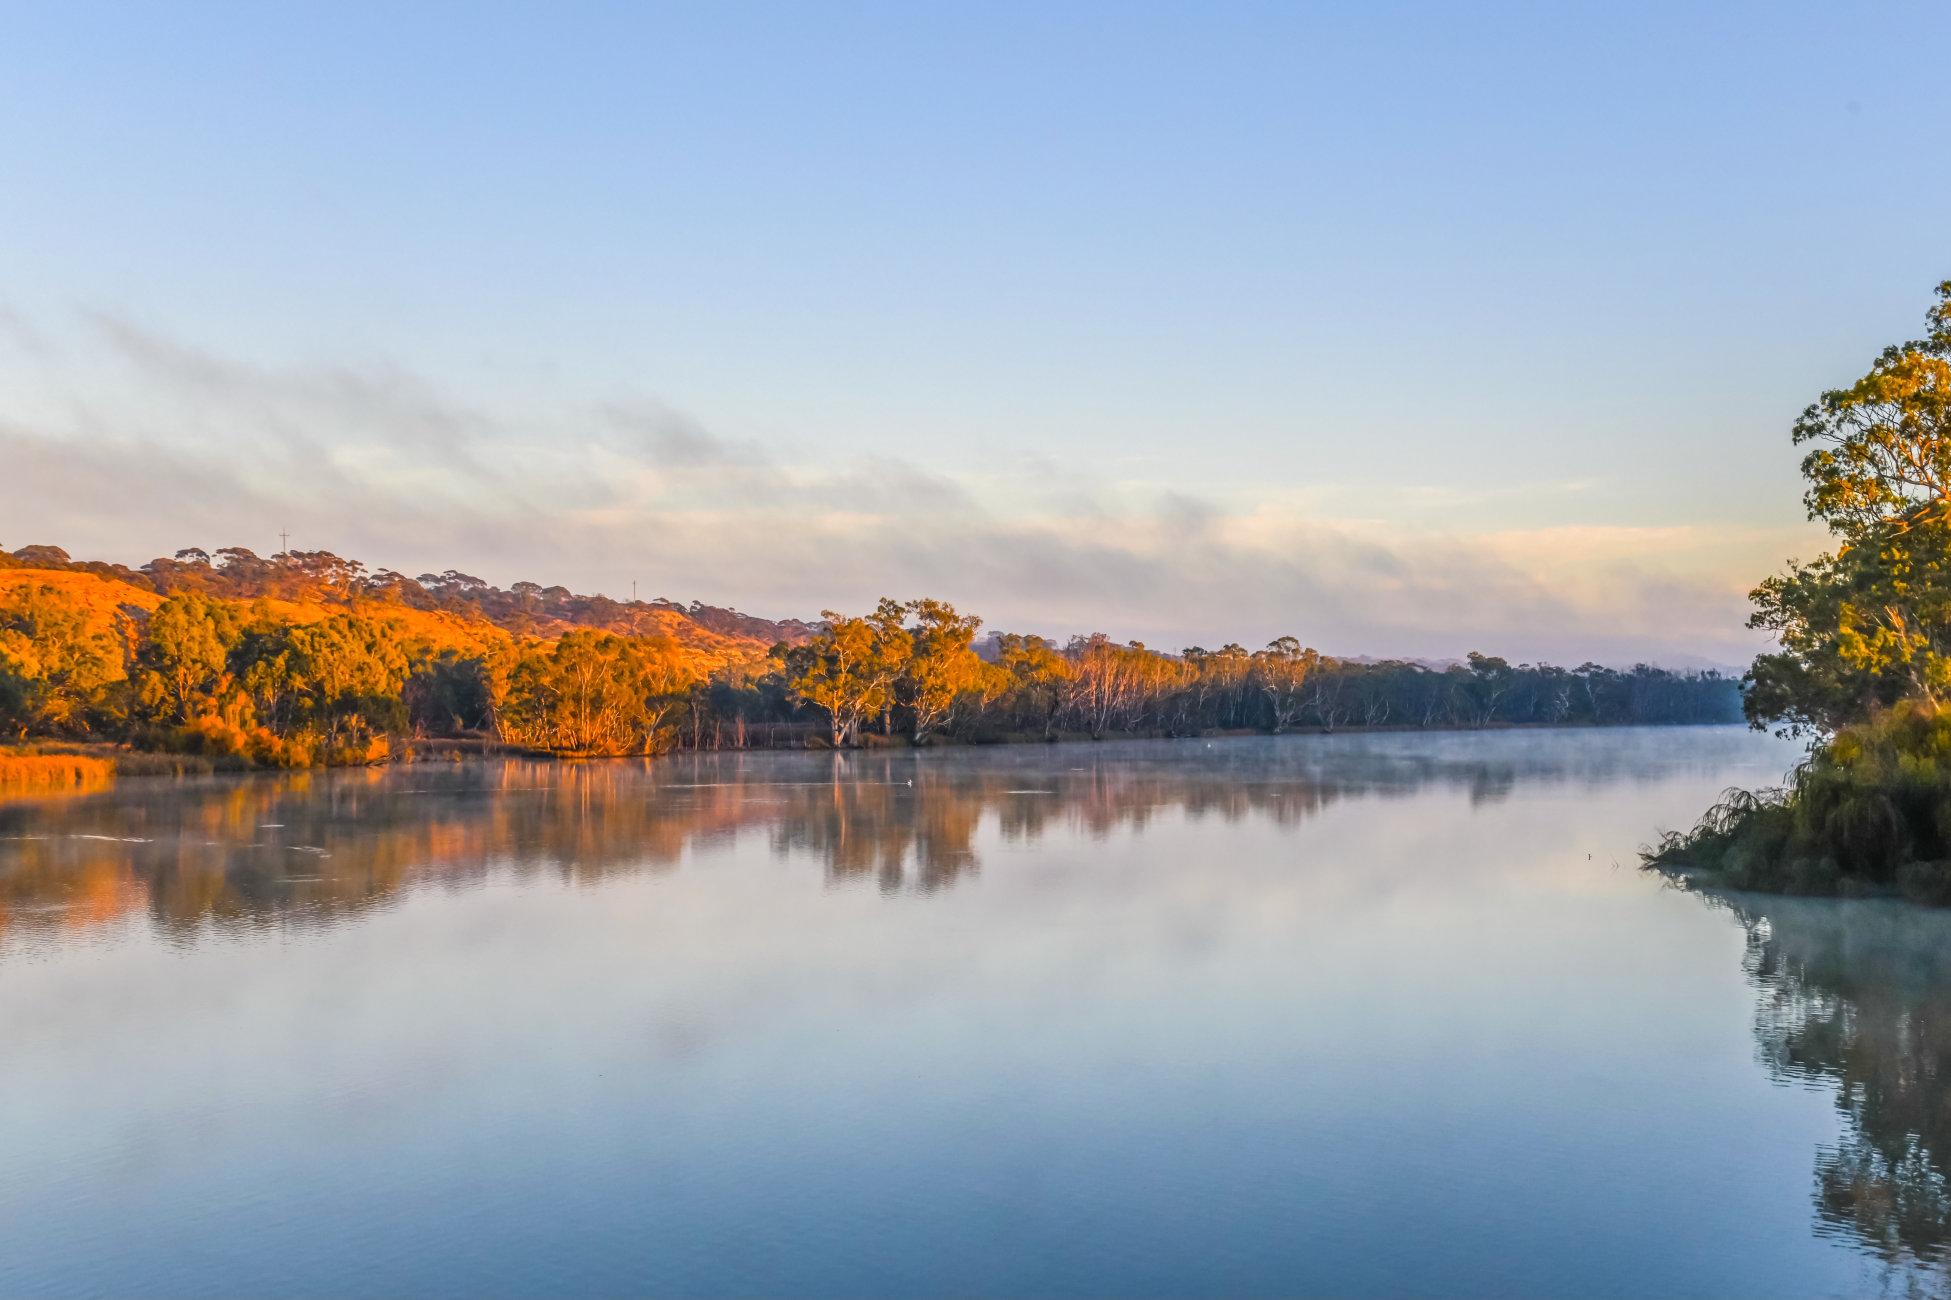 Sunrise on the Murray